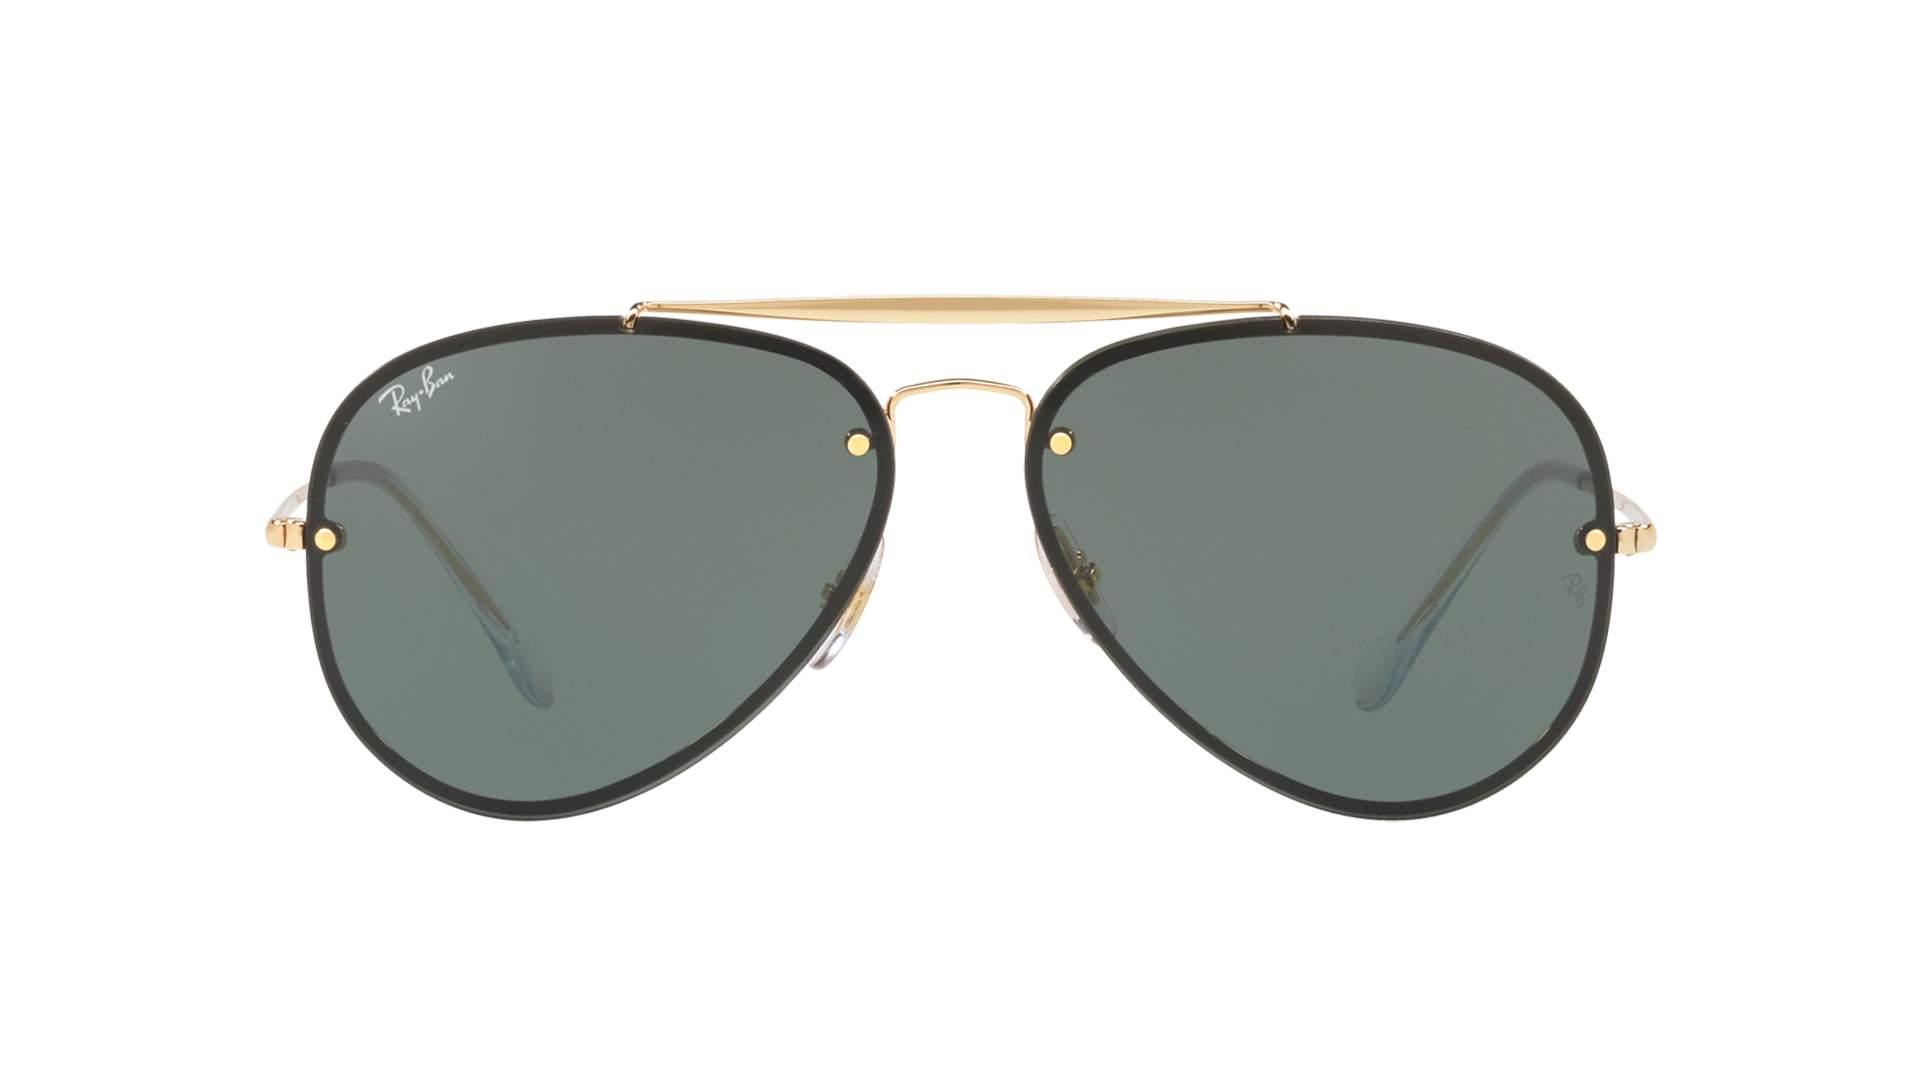 05cda9d987 Sunglasses Ray-Ban Blaze Aviator Gold RB3584N 9050/71 58-13 Medium